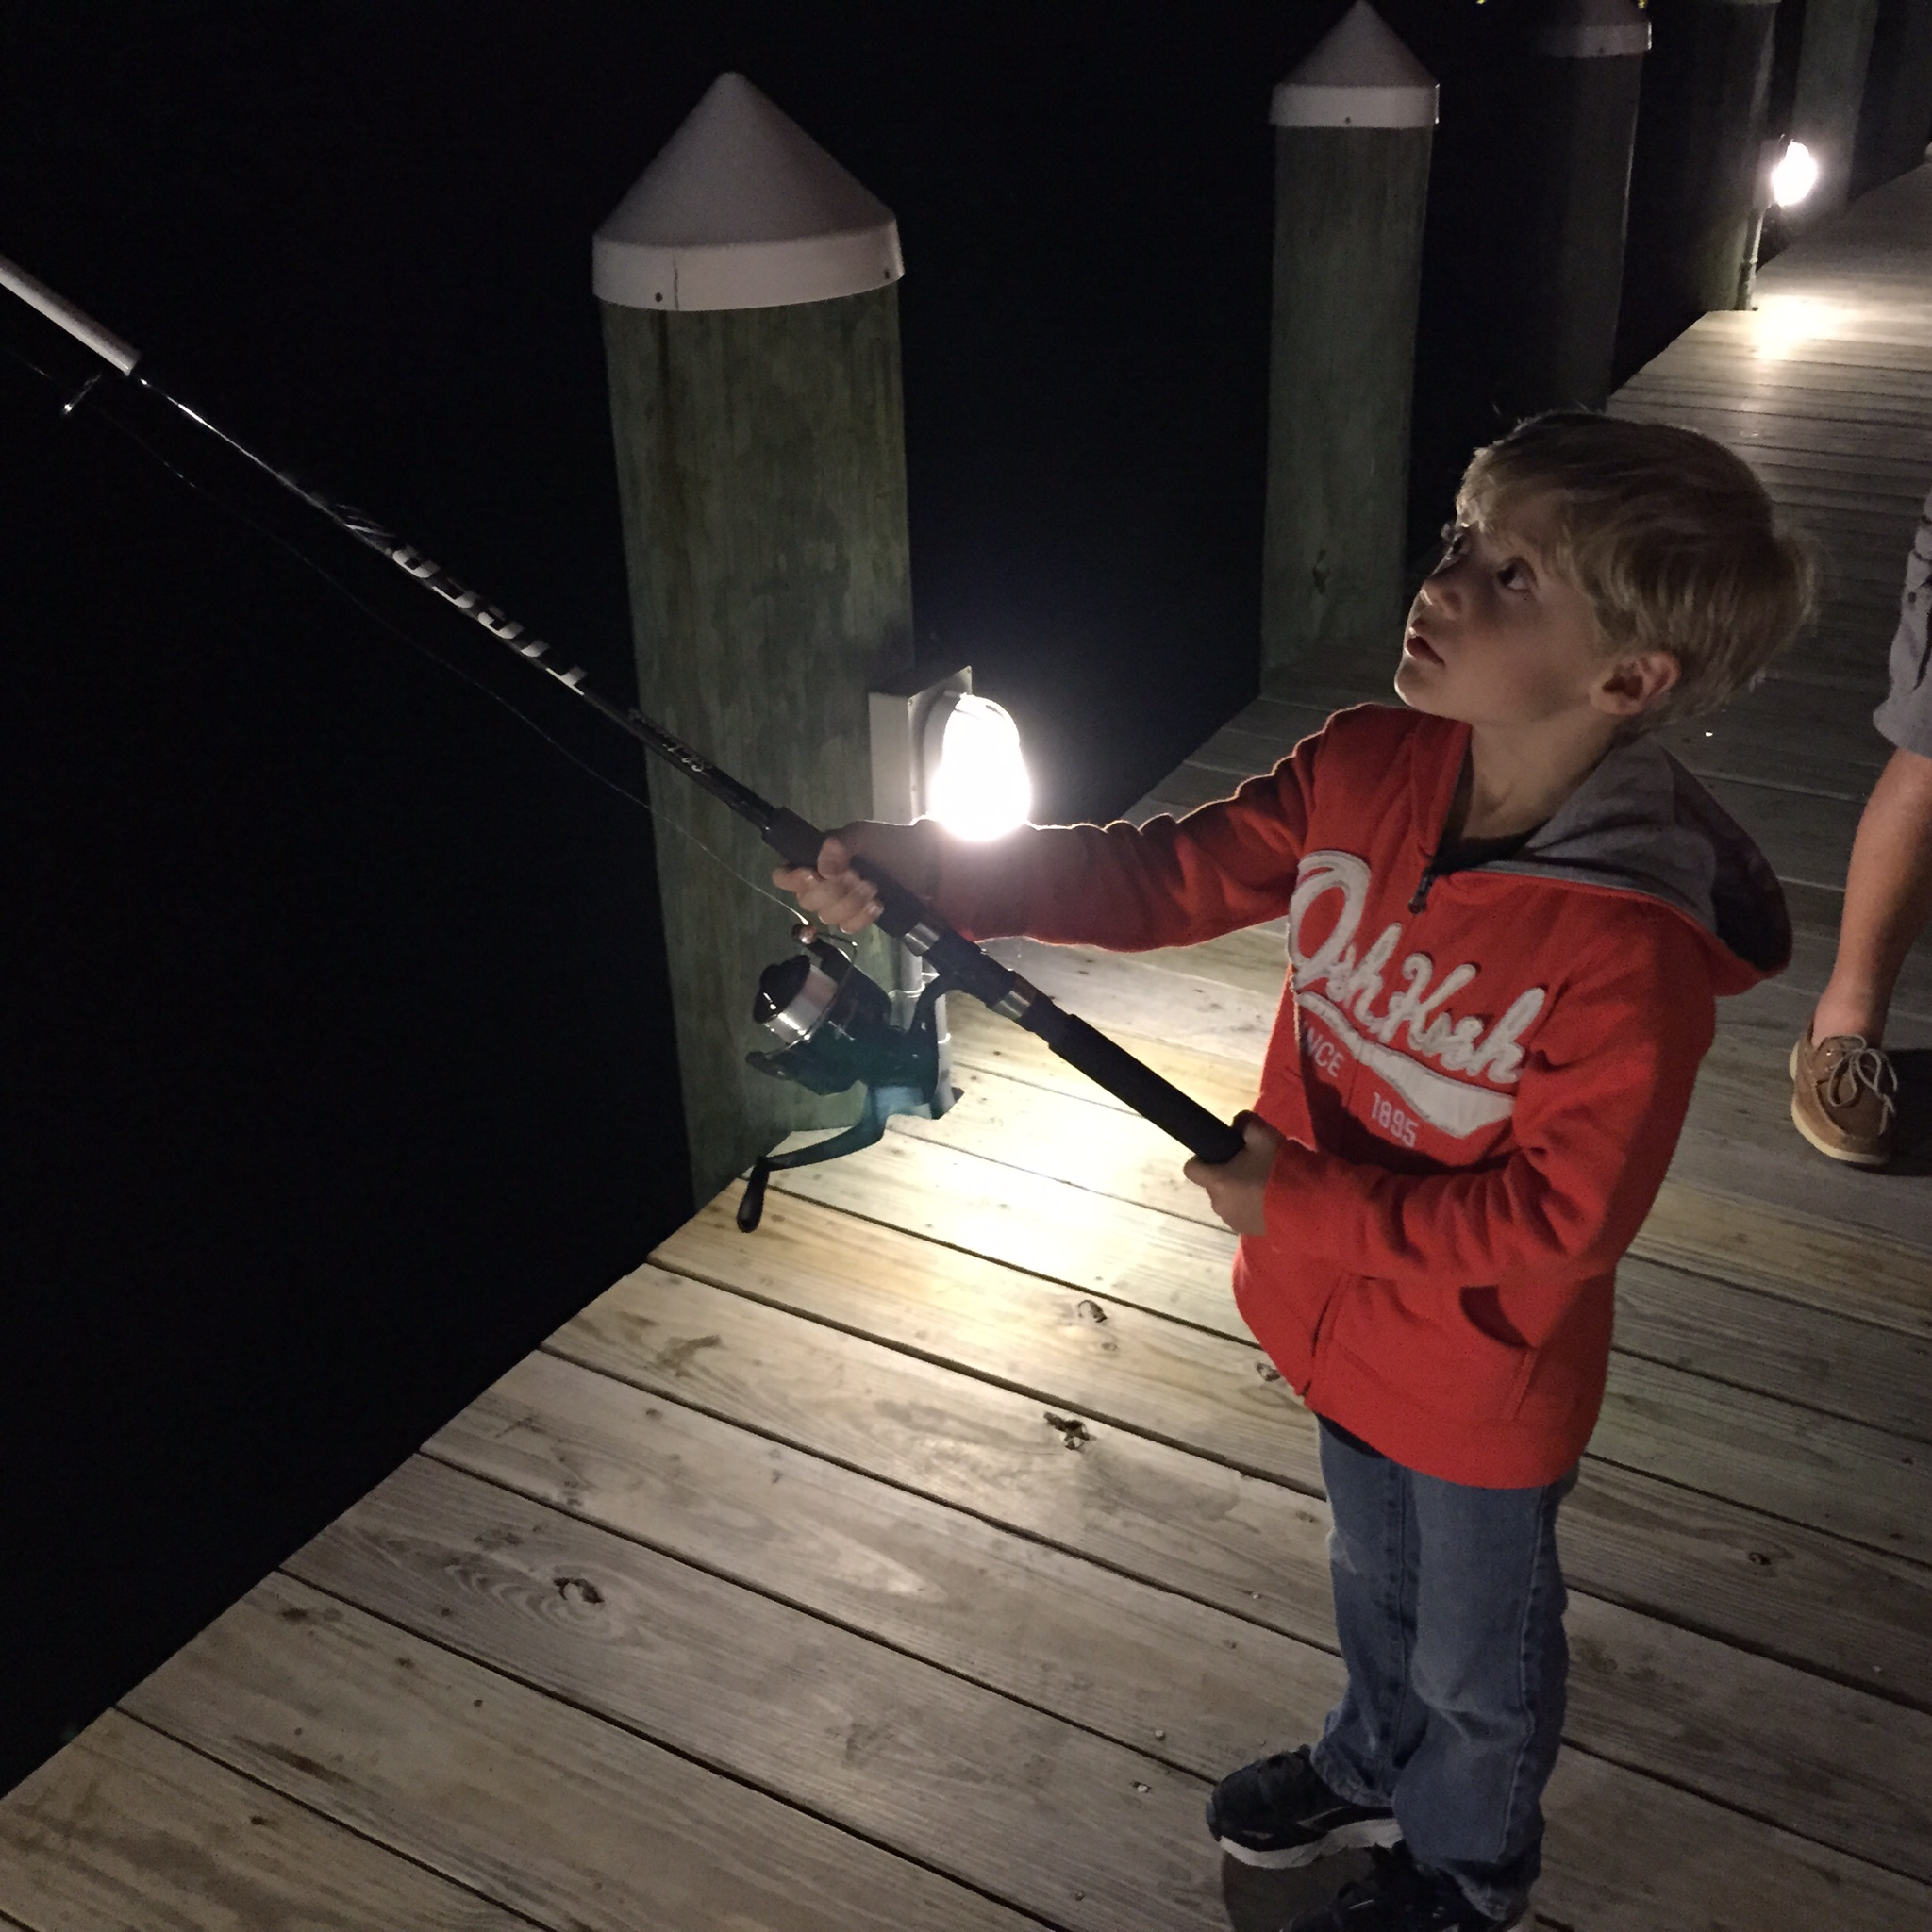 Logan fishes